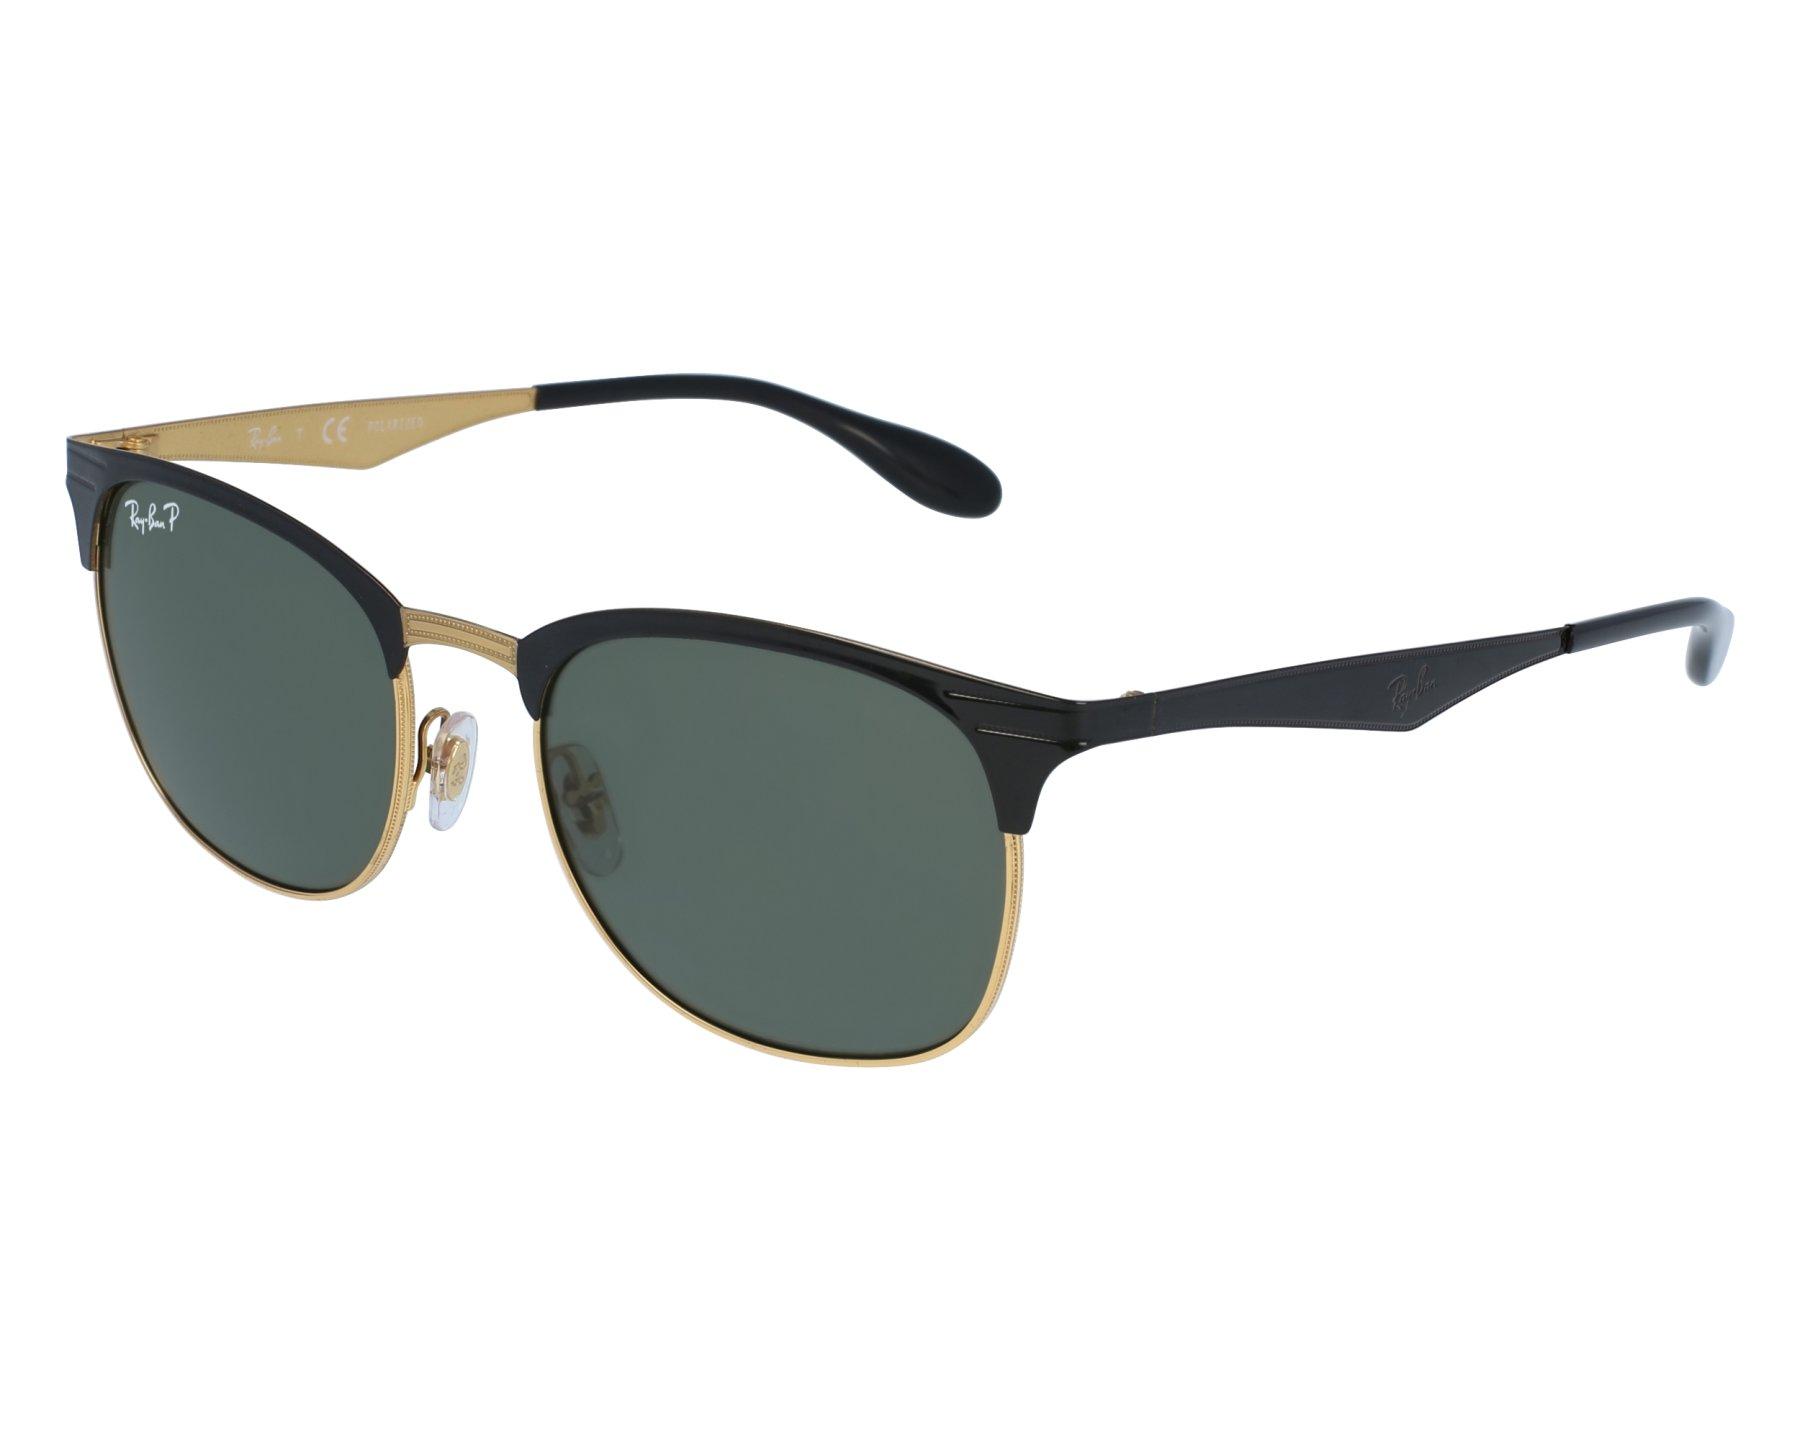 043ac8e329 Ray-Ban Sunglasses RB-3538 187 9A